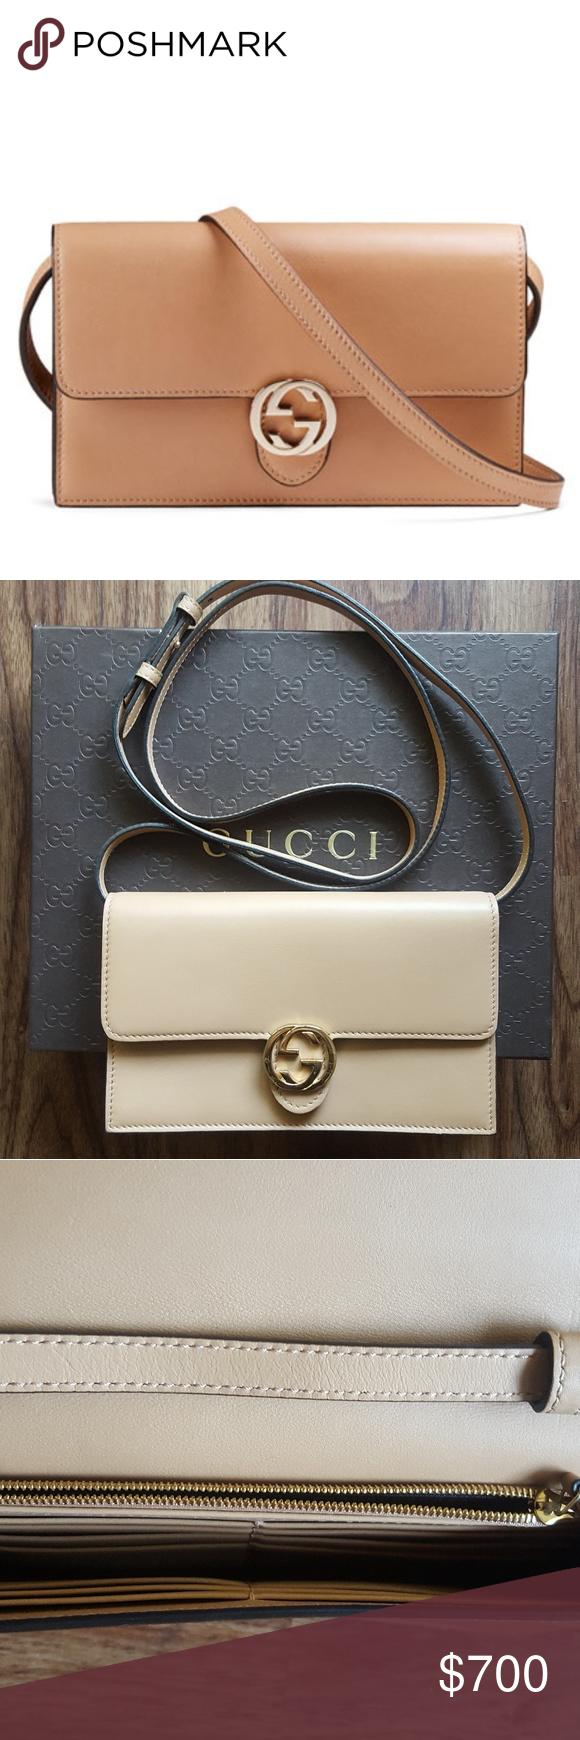 bd7e4d651e2 Gucci Icon Leather Wallet with Strap - Authentic Gucci leather wallet with  interlocking